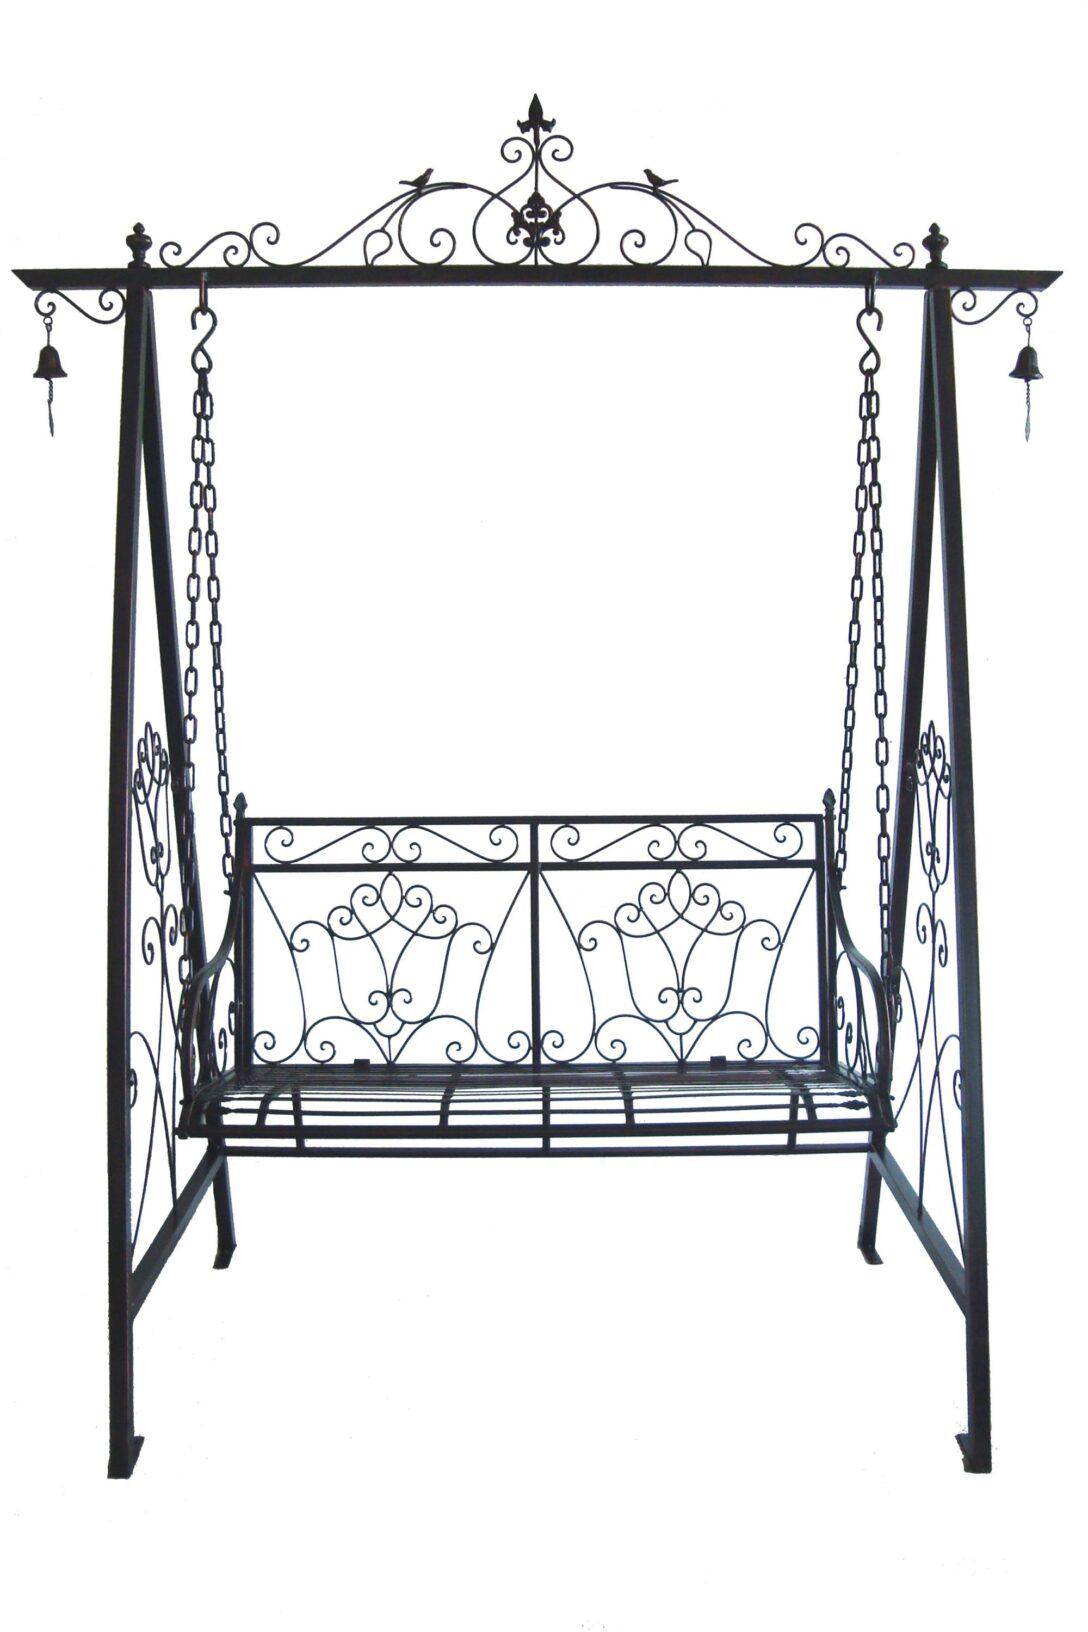 Large Size of Gartenschaukel Kinderschaukel Garten Regal Metall Bett Weiß Schaukelstuhl Schaukel Regale Für Wohnzimmer Schaukel Metall Erwachsene